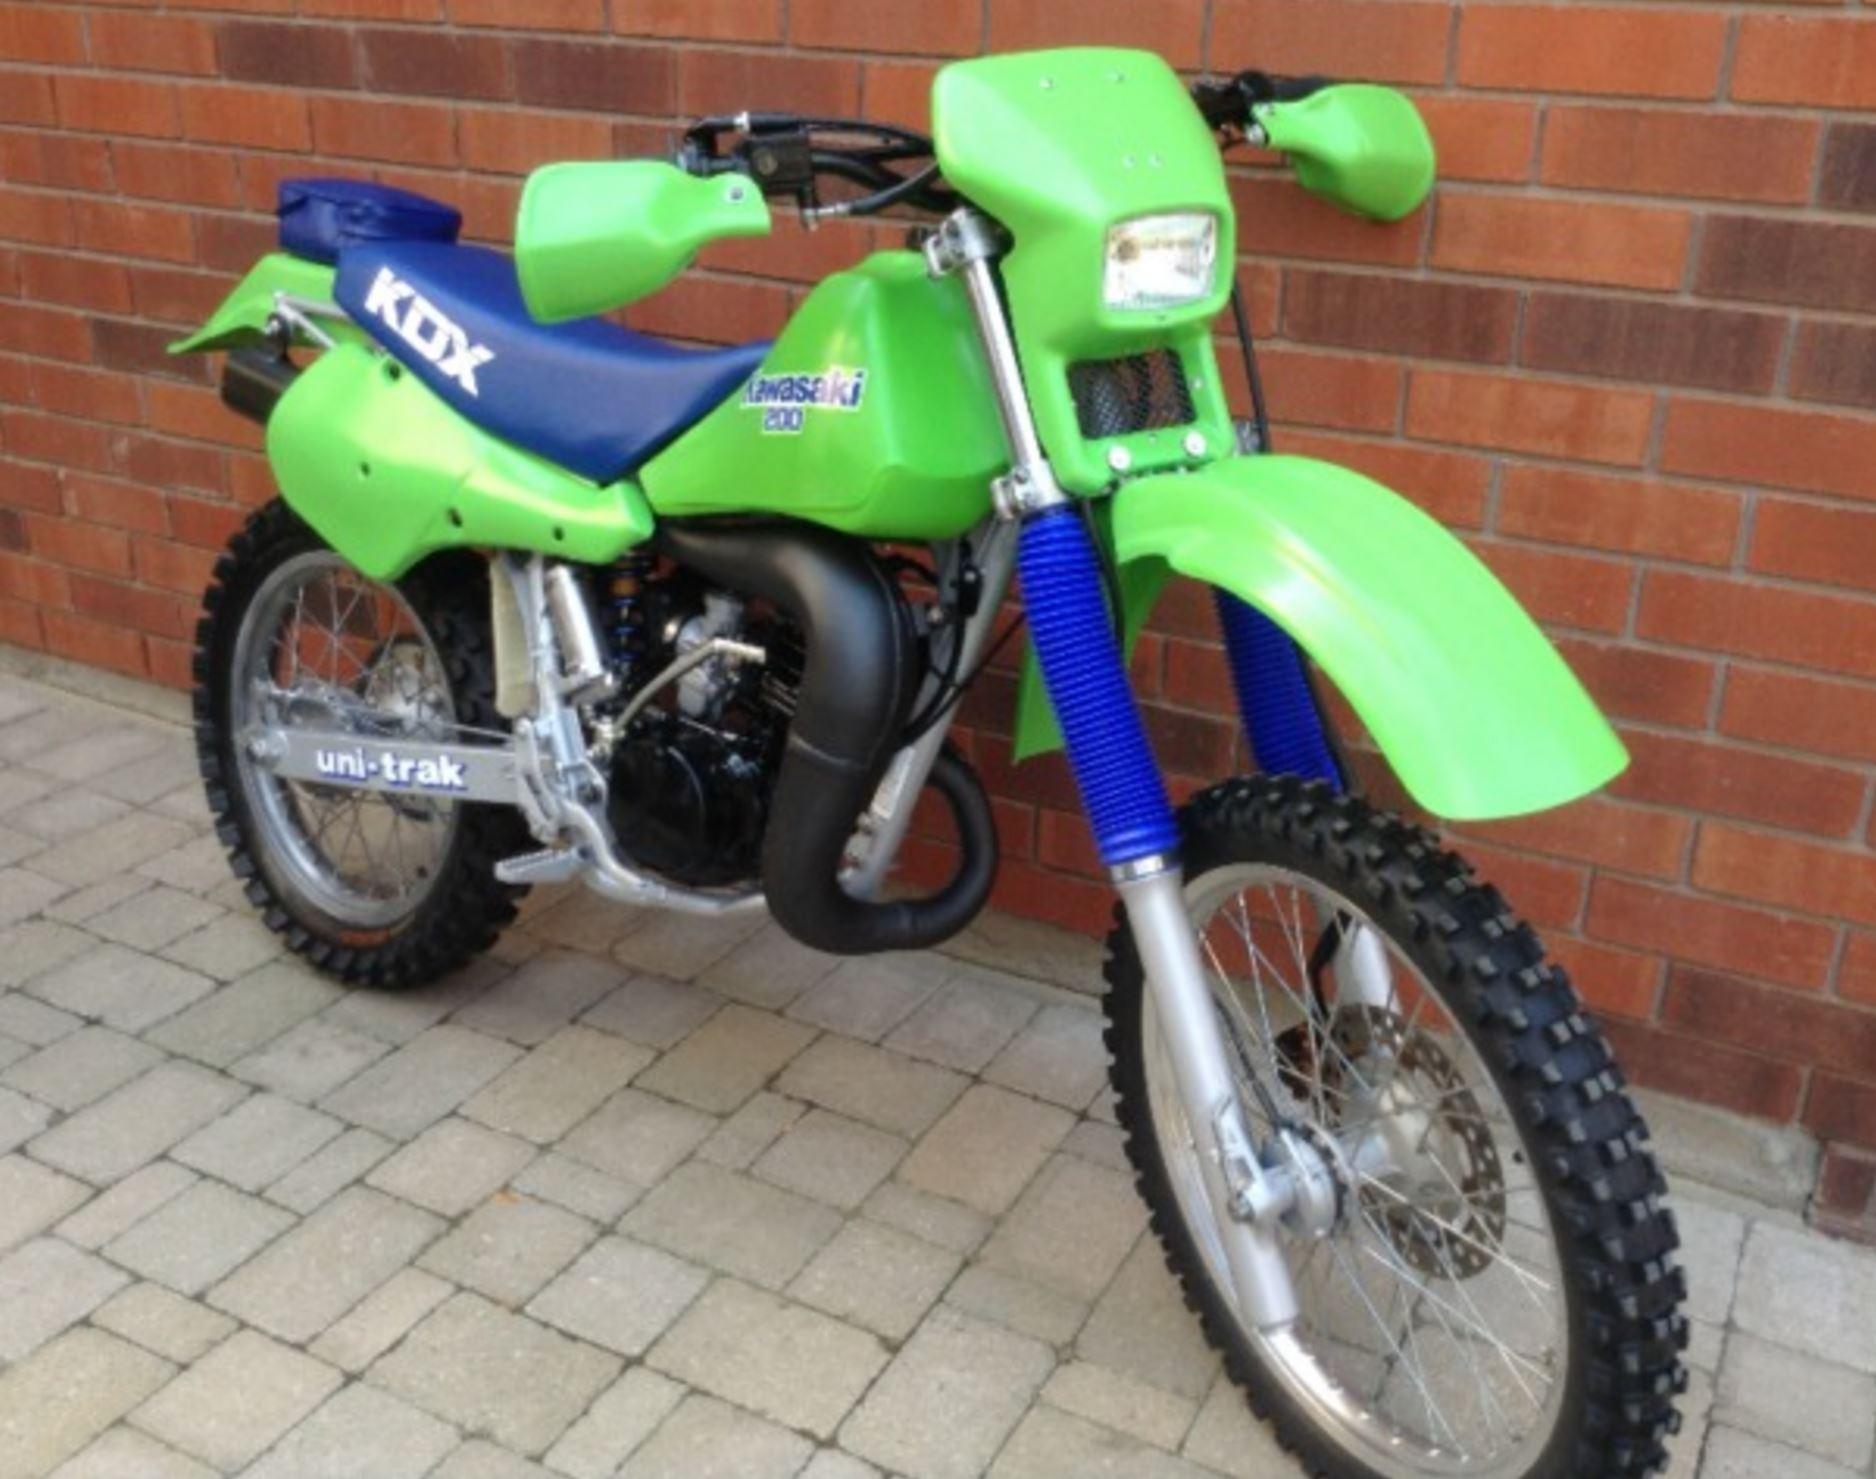 Kawasaki Kdx 200 Wiring Diagram Library Yamaha Yl2 Restored 1987 Kdx200 Bike Urious Rh Com 1989 1990